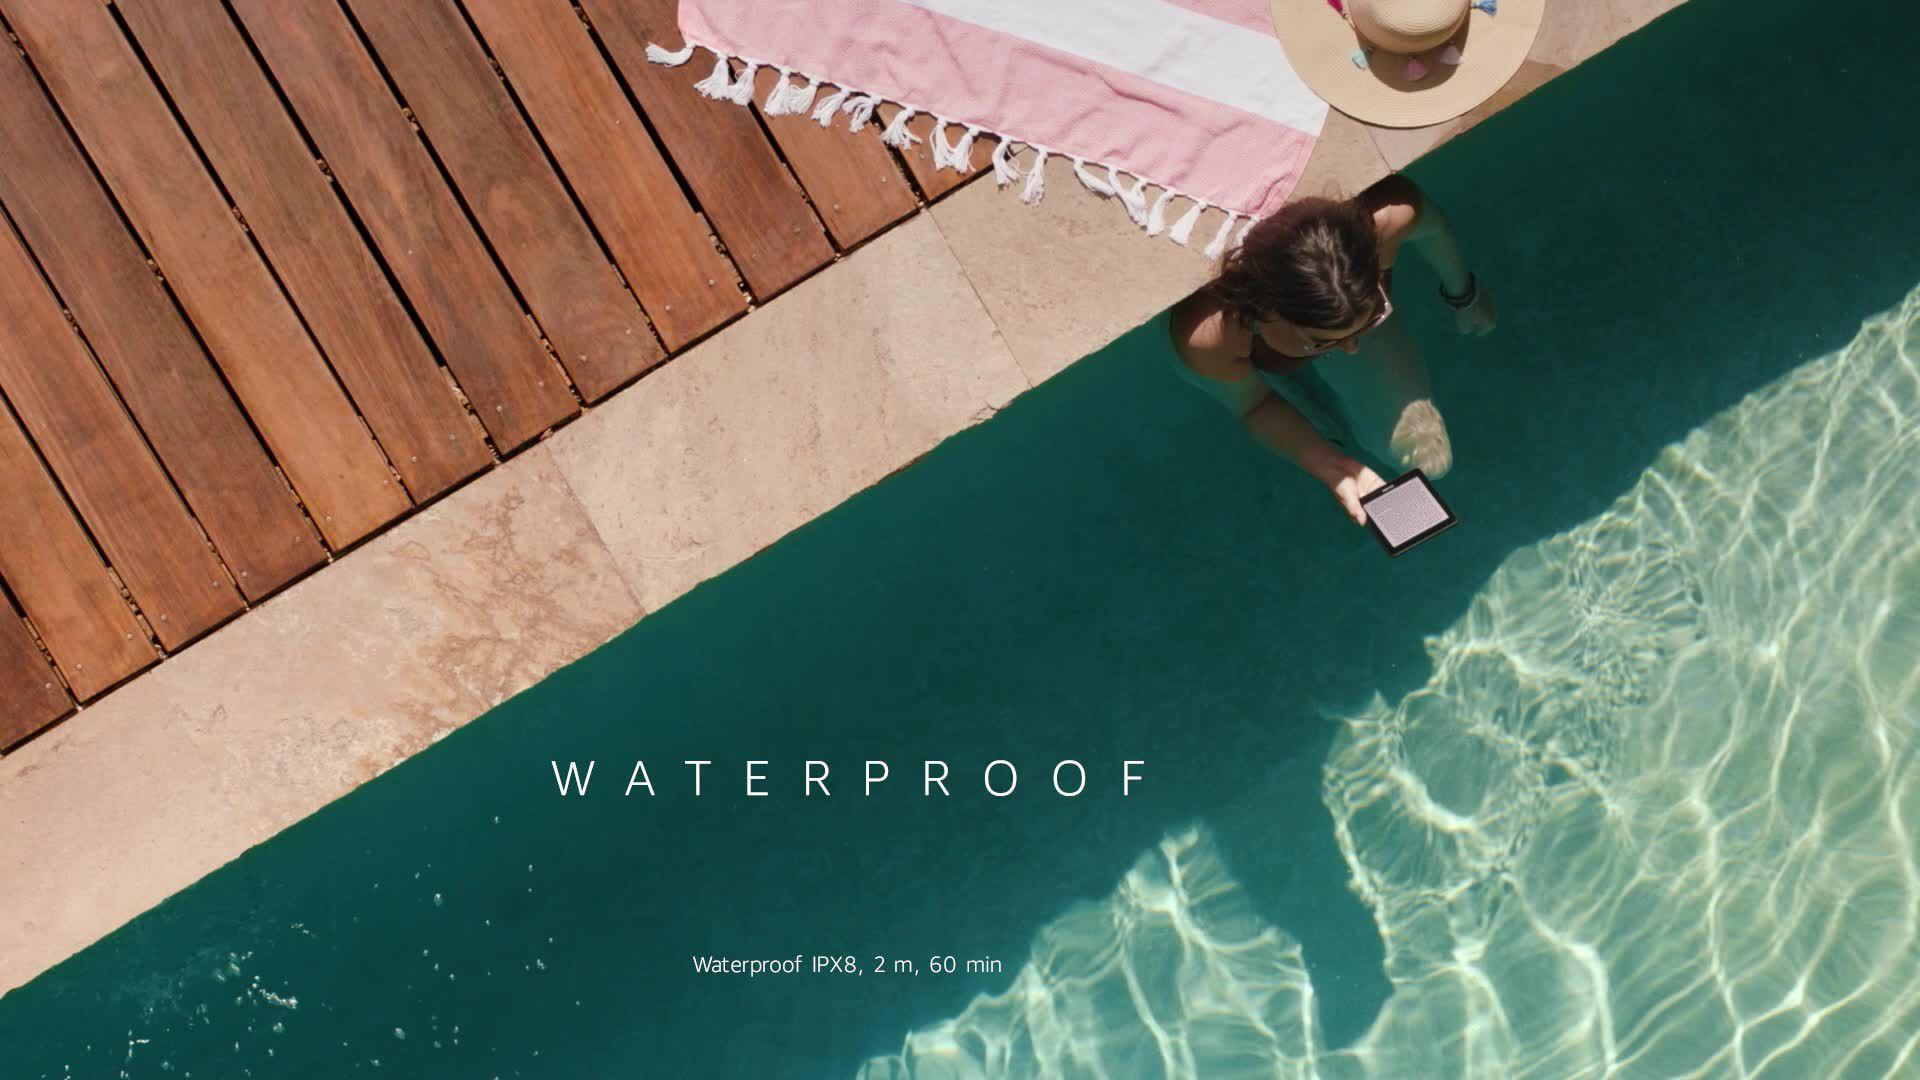 Amazon Kindle Paperwhite, Waterproof eReader, 6